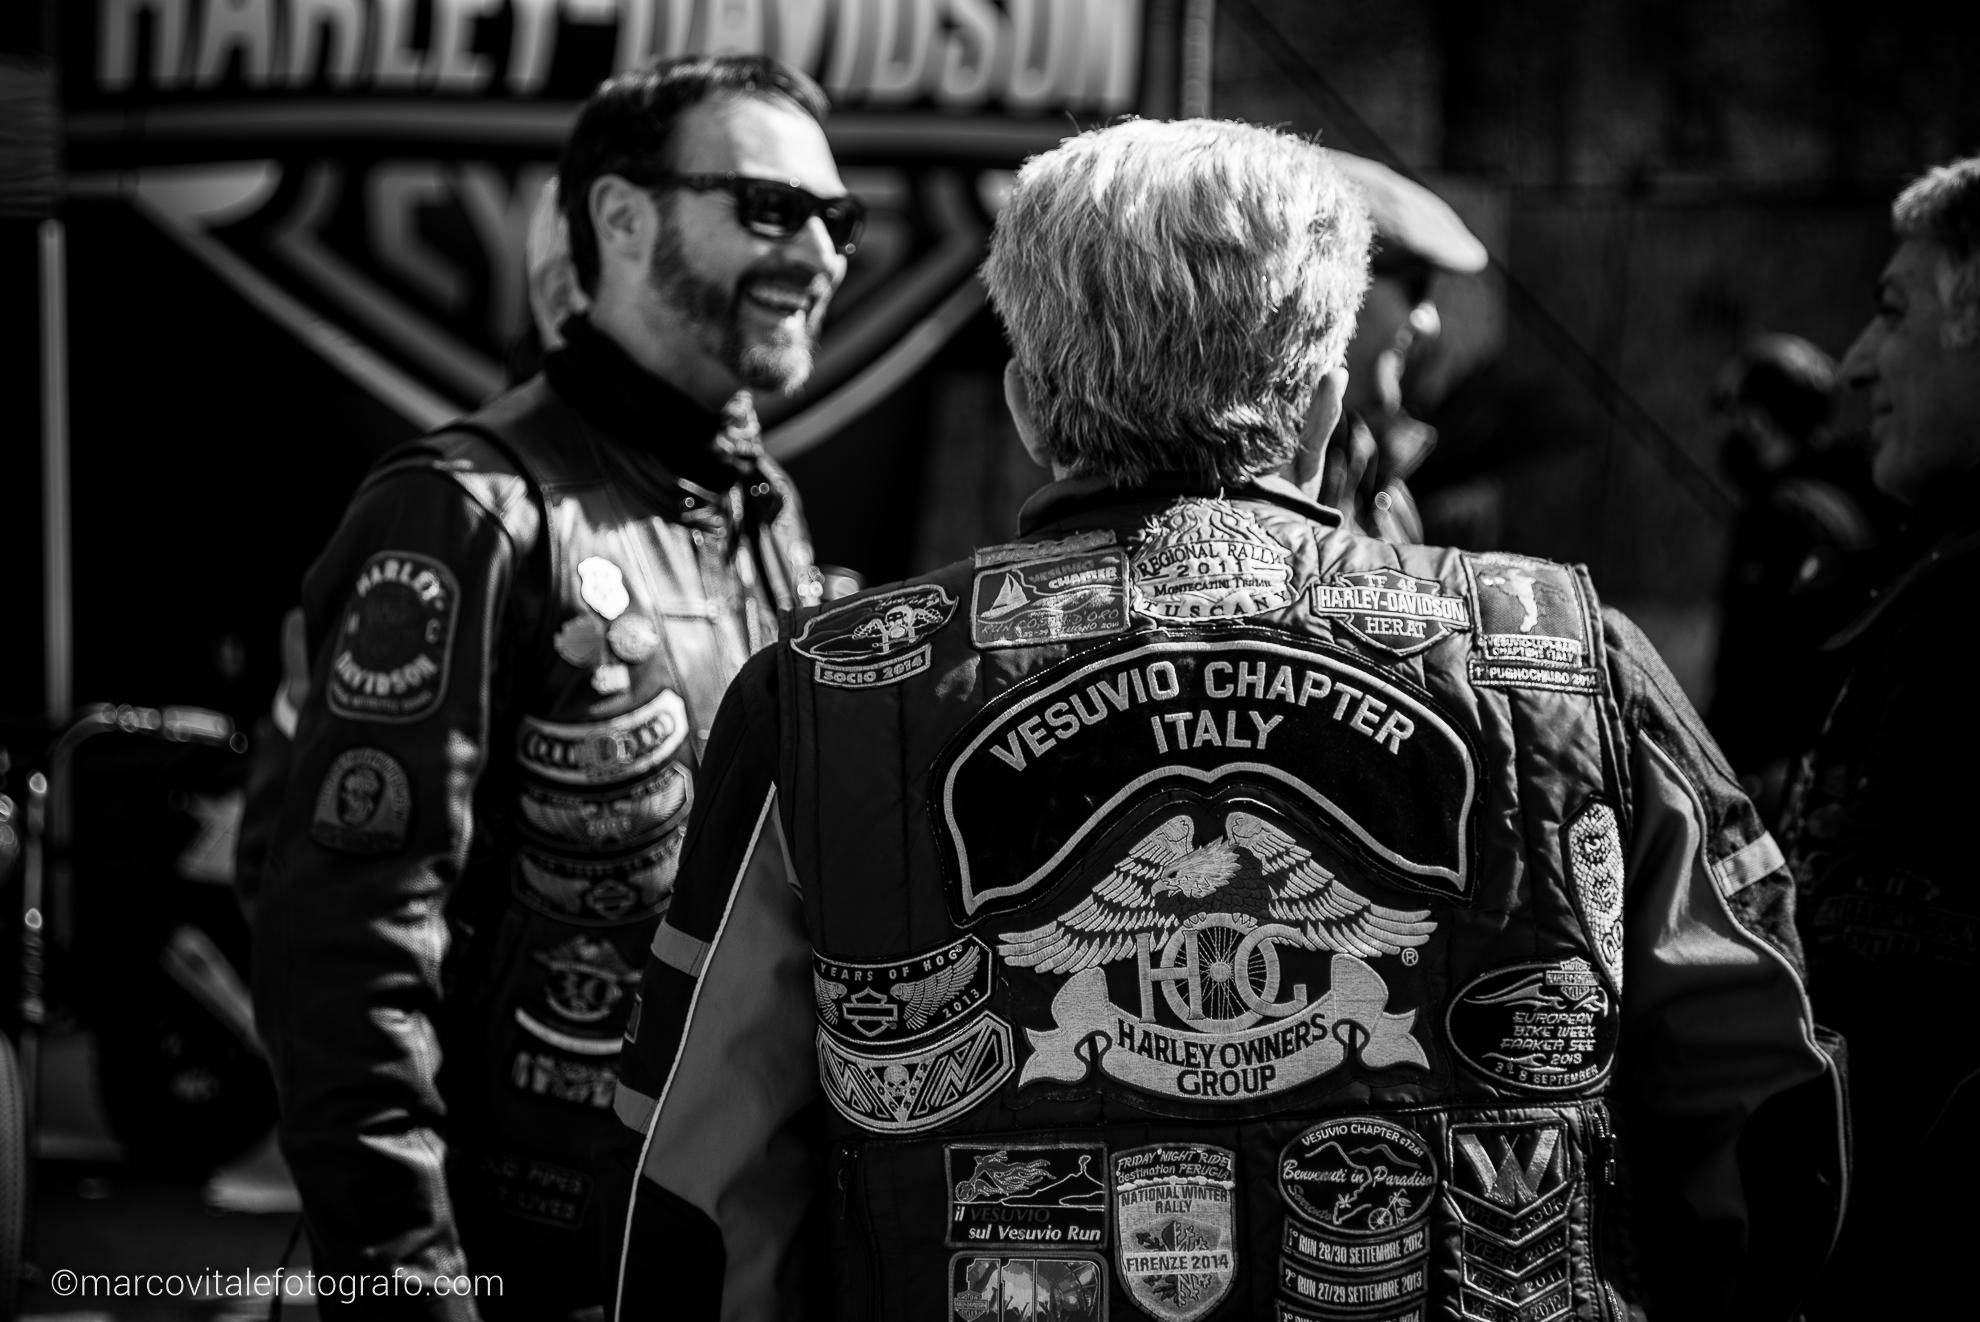 Fotografo per raduni motociclistici - Salerno